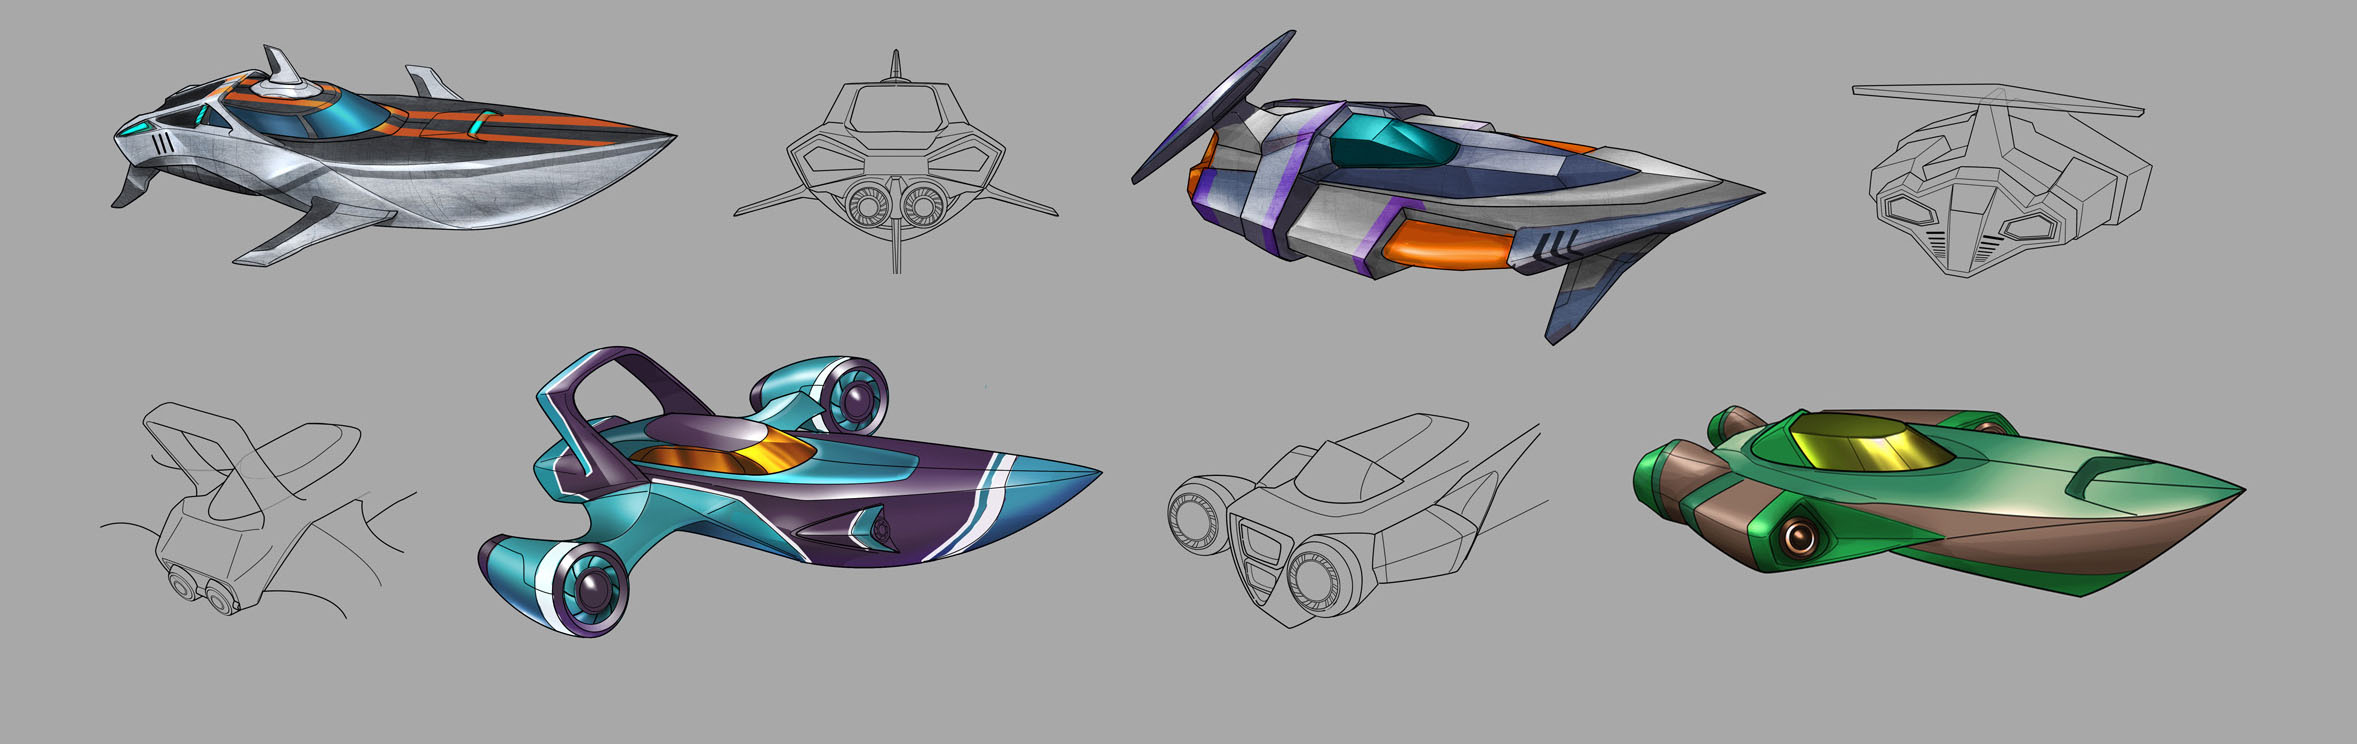 SpeedBoats01.jpg